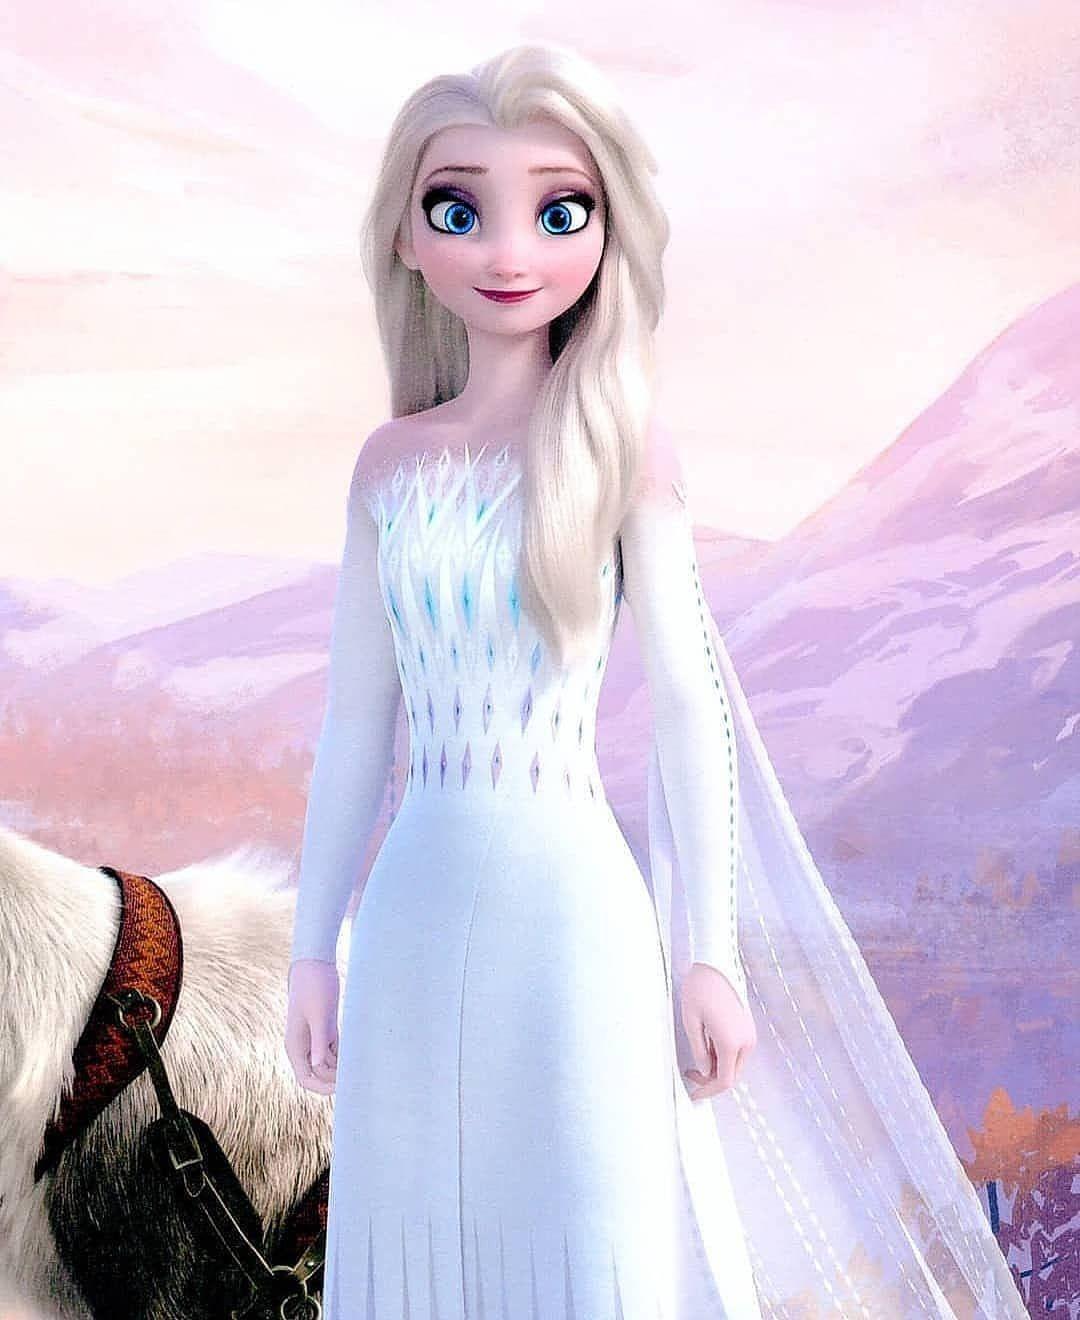 Elsa Reviras On Instagram Omg So Cute Beautiful Frozen2 Elsa Frozen Disney Princess Elsa Disney Frozen Elsa Disney Princess Frozen